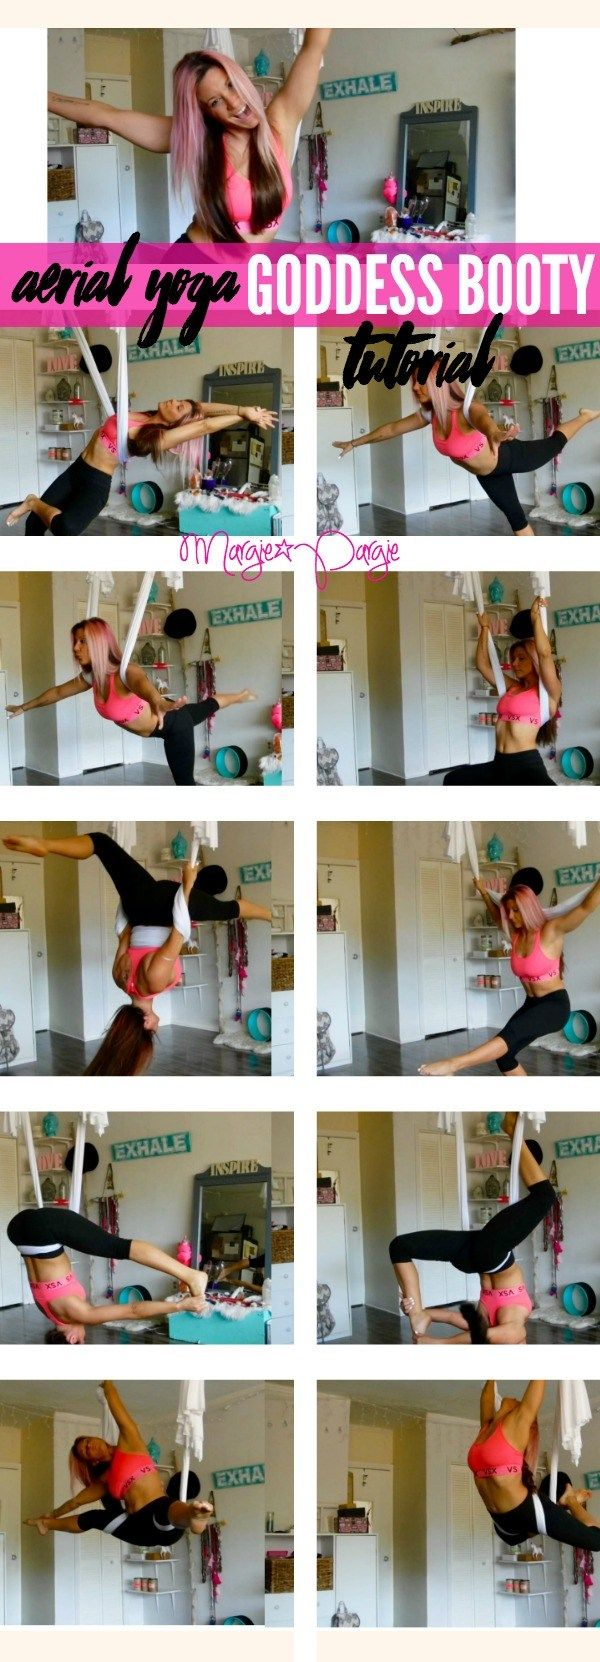 Aerial Yoga Goddess Booty Tutorial - Margie Pargie